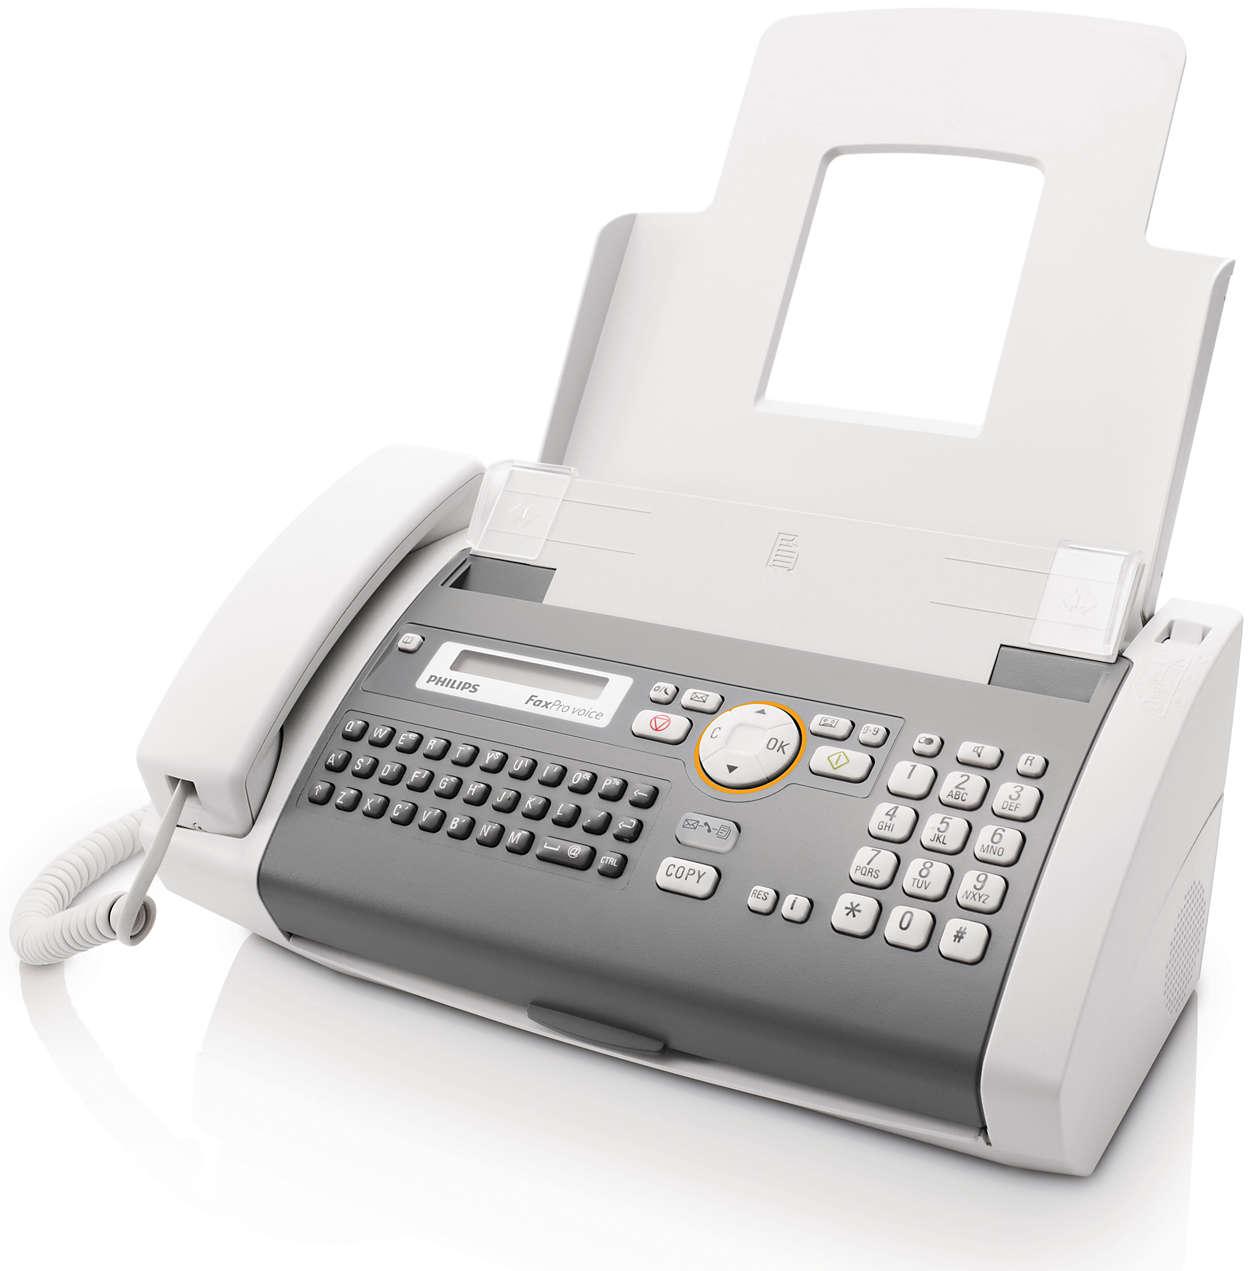 Envios de fax fiáveis